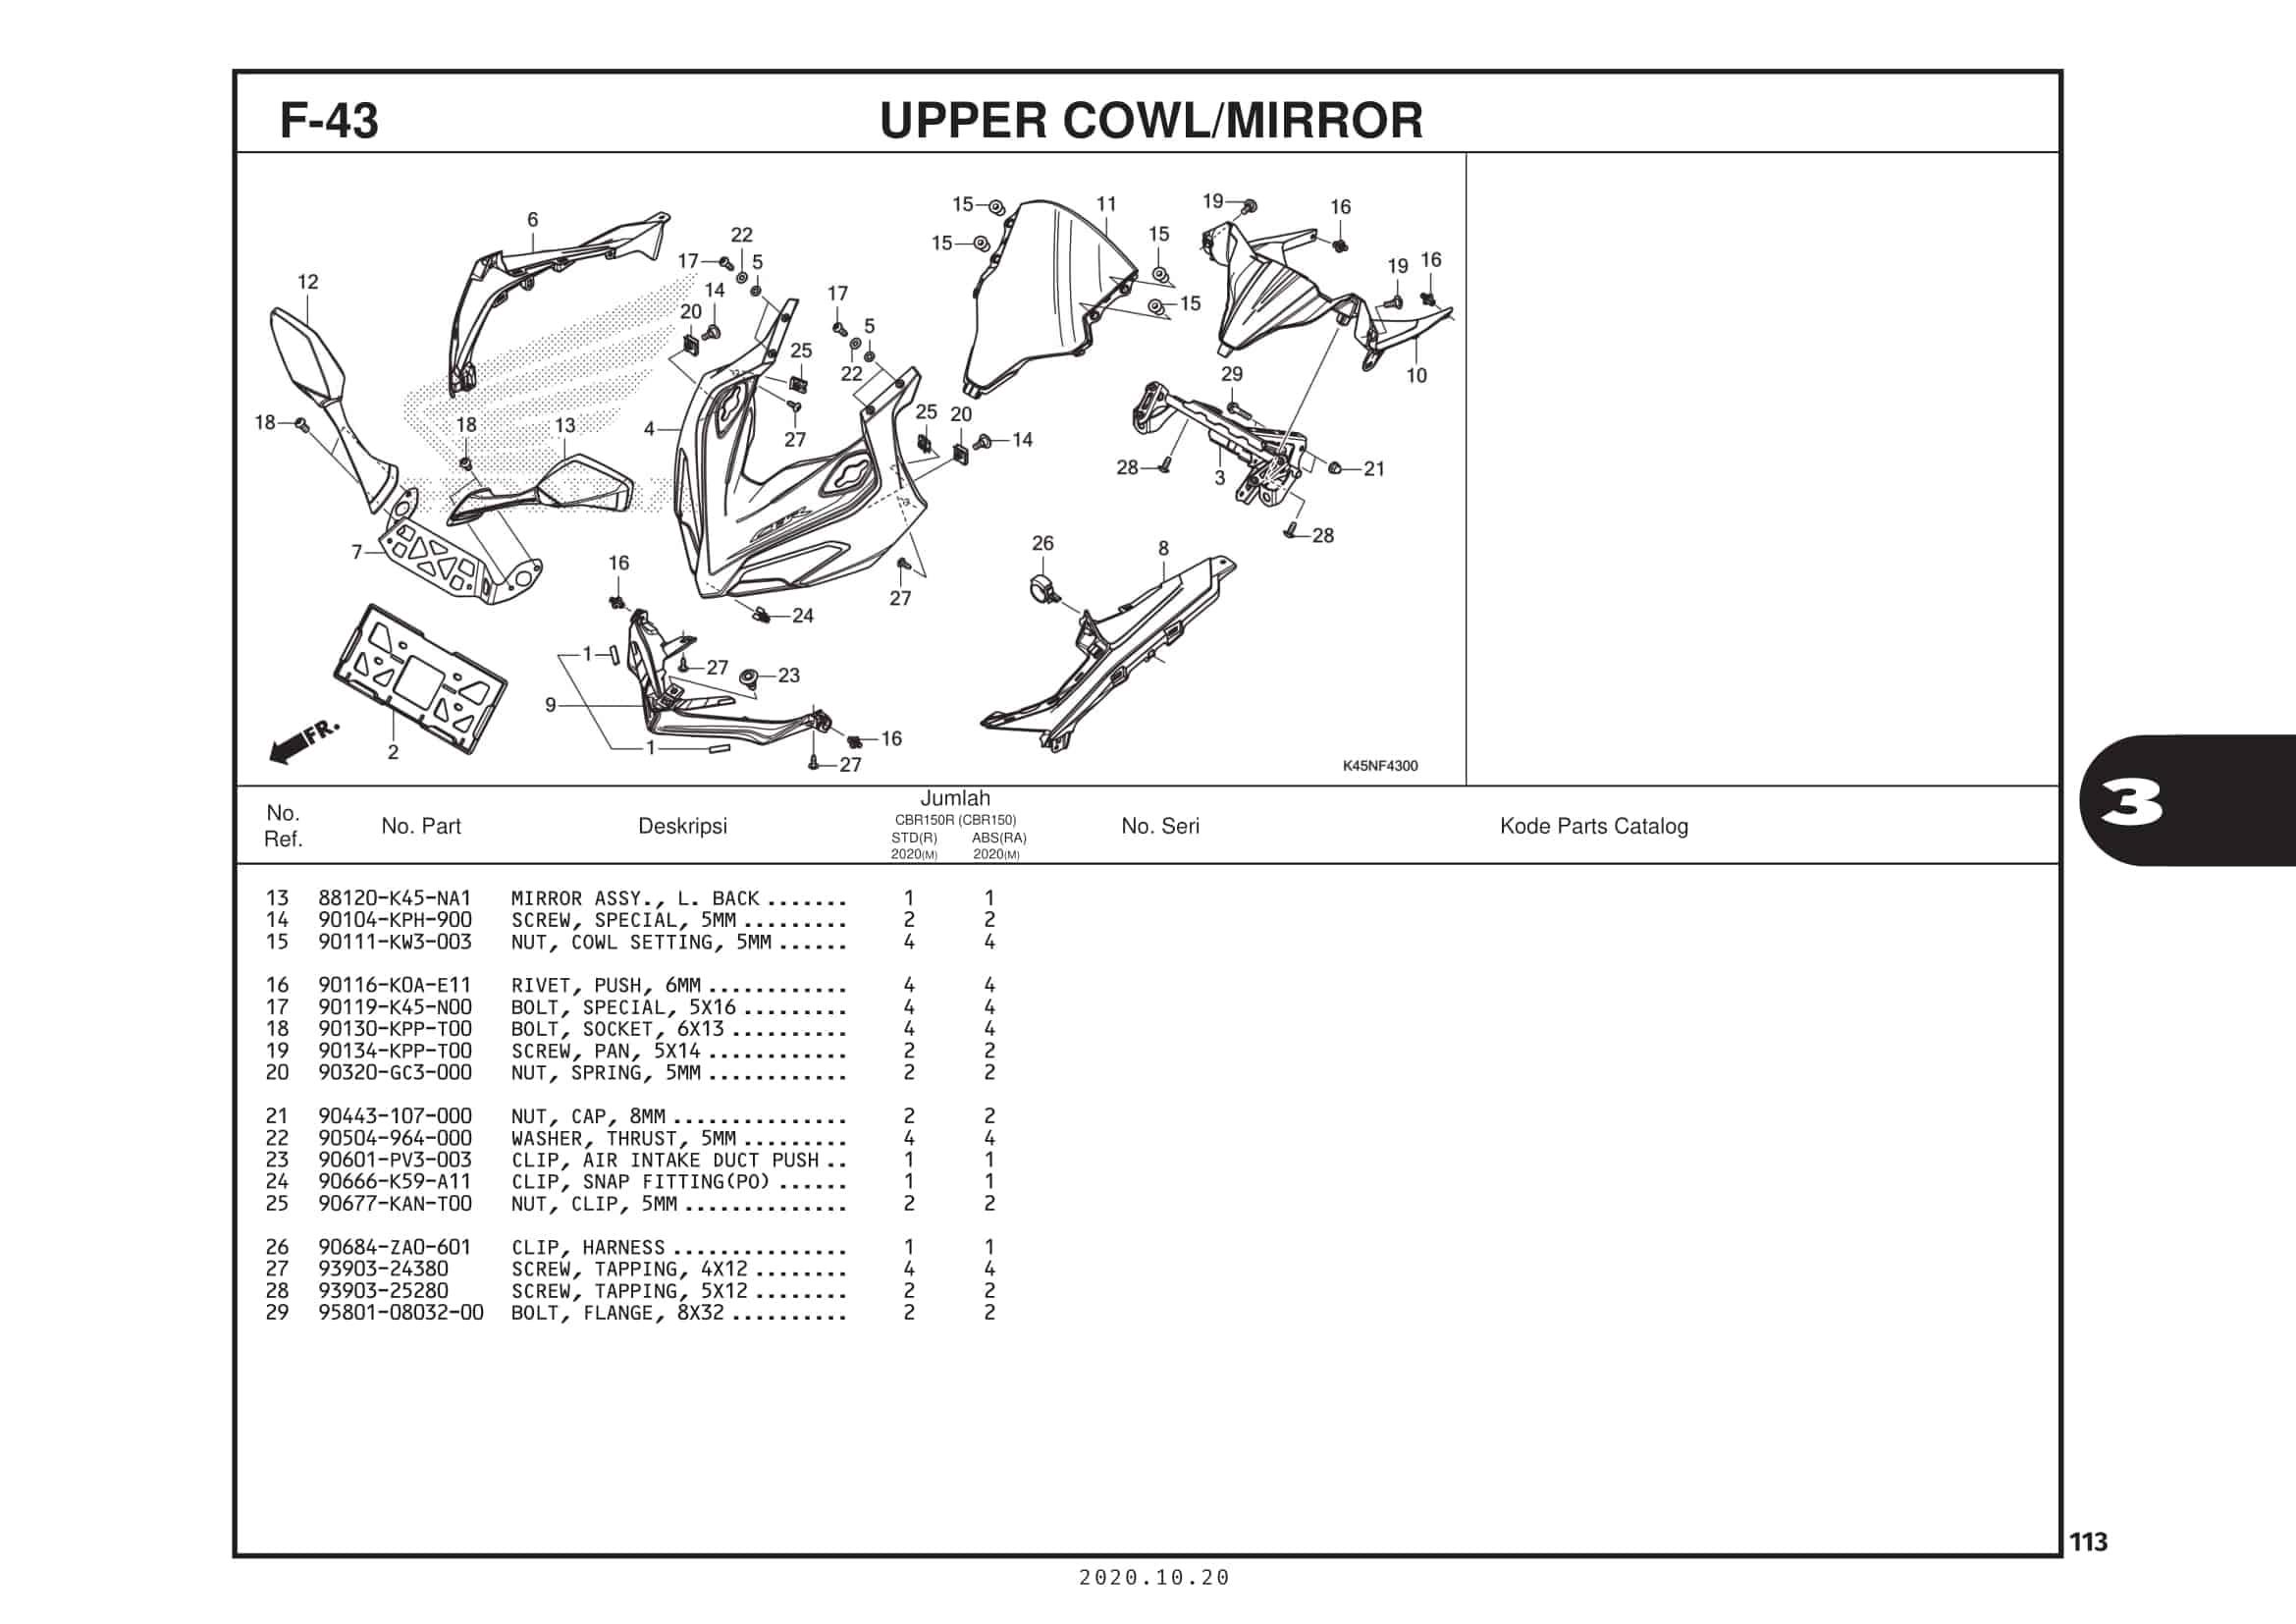 F-43 Upper Cowl/Mirorr